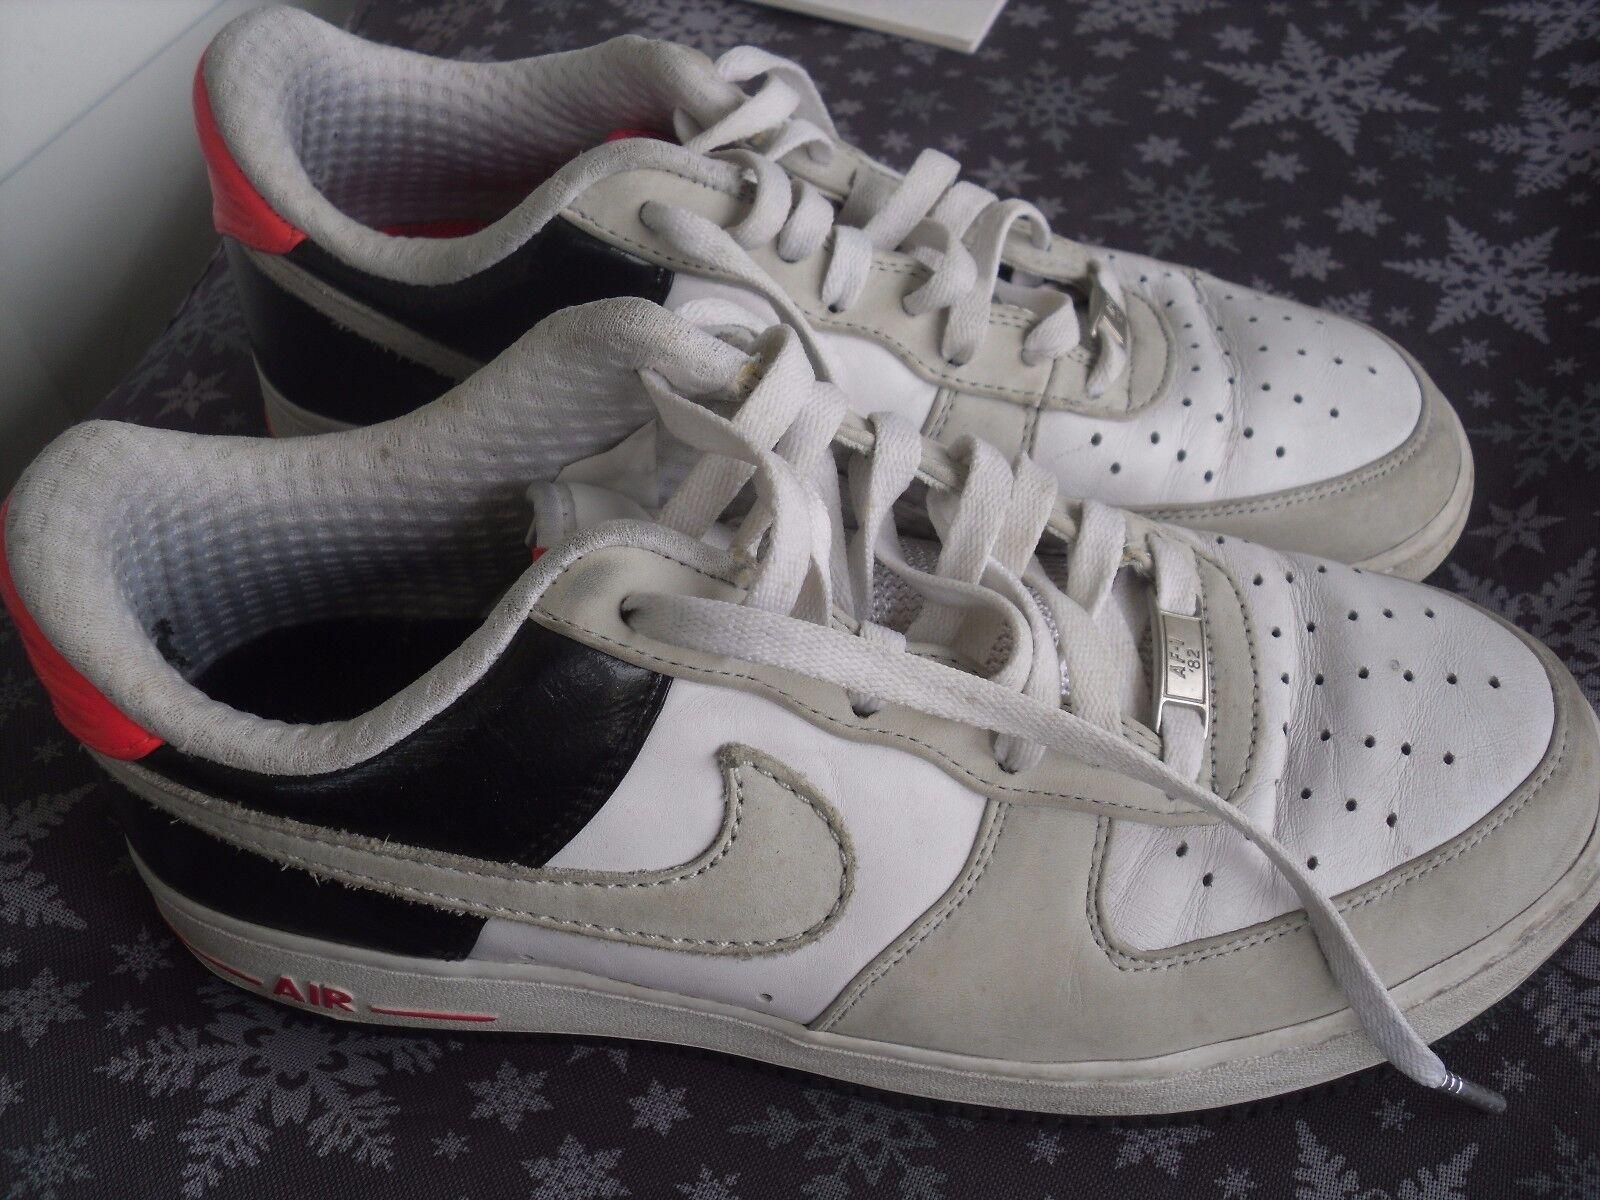 Nike air force 1 white nuetral grey sz 9 318775-101 02 / 19 / 08